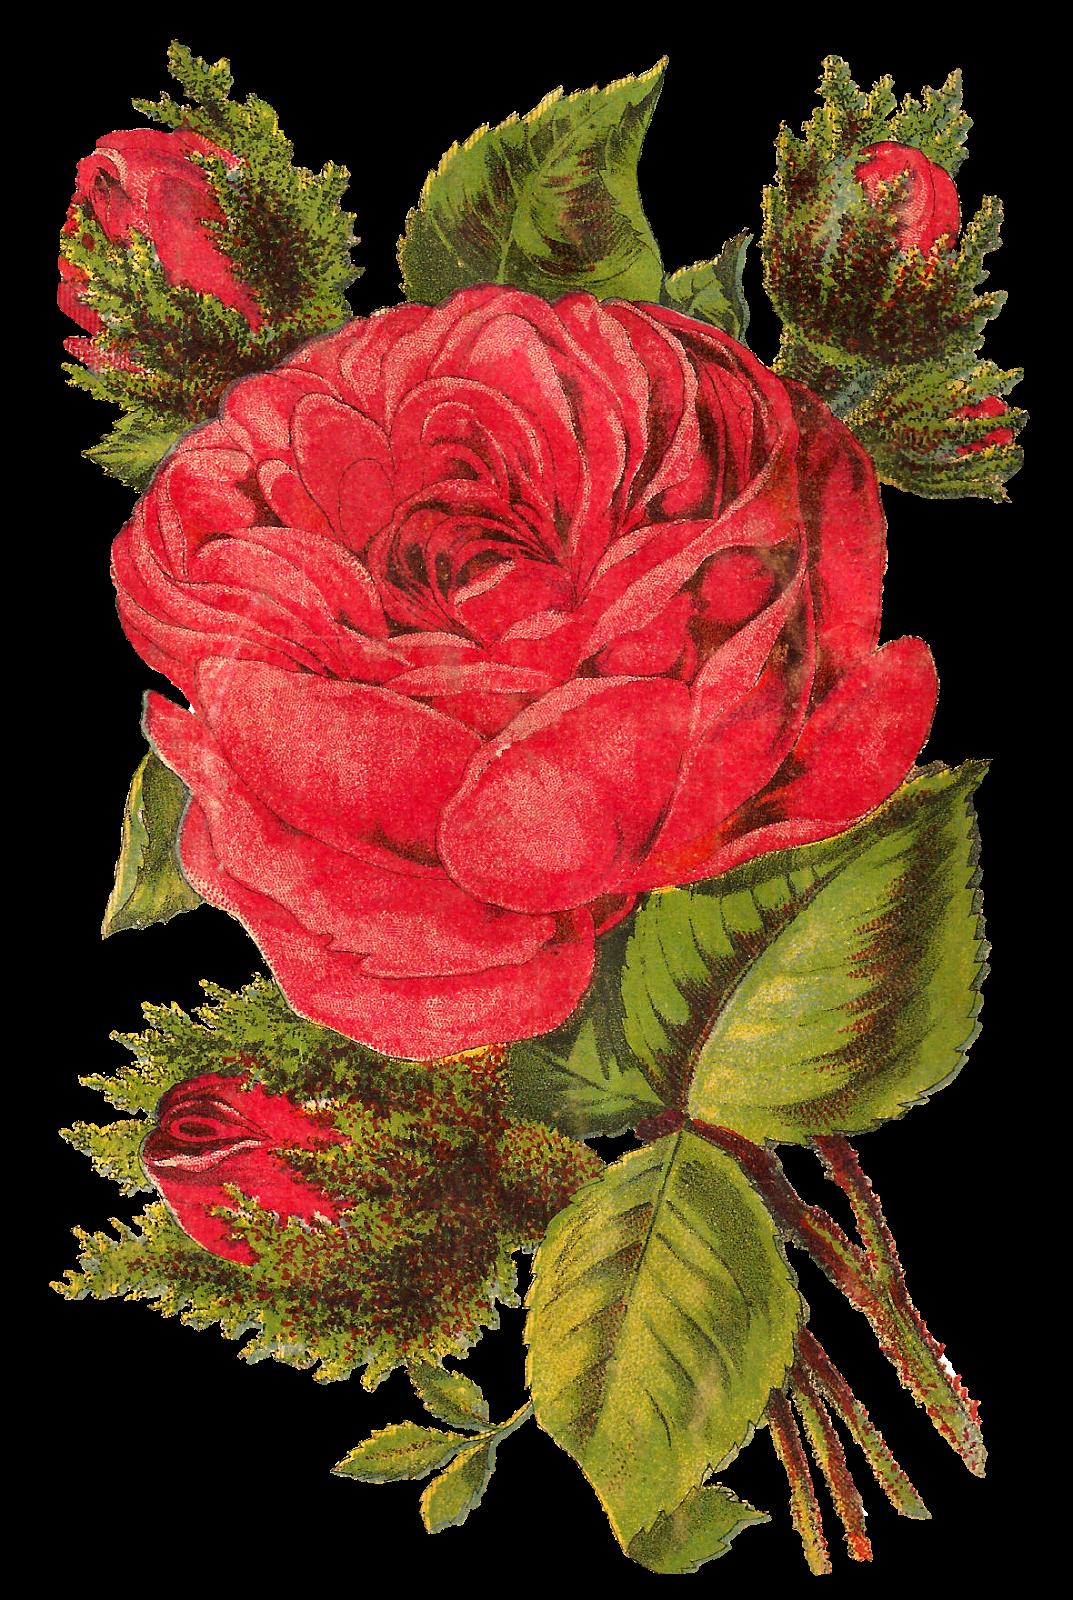 Flower image download png free download Antique Images: Free Red Rose Digital Clip Art Seed Catalog ... png free download